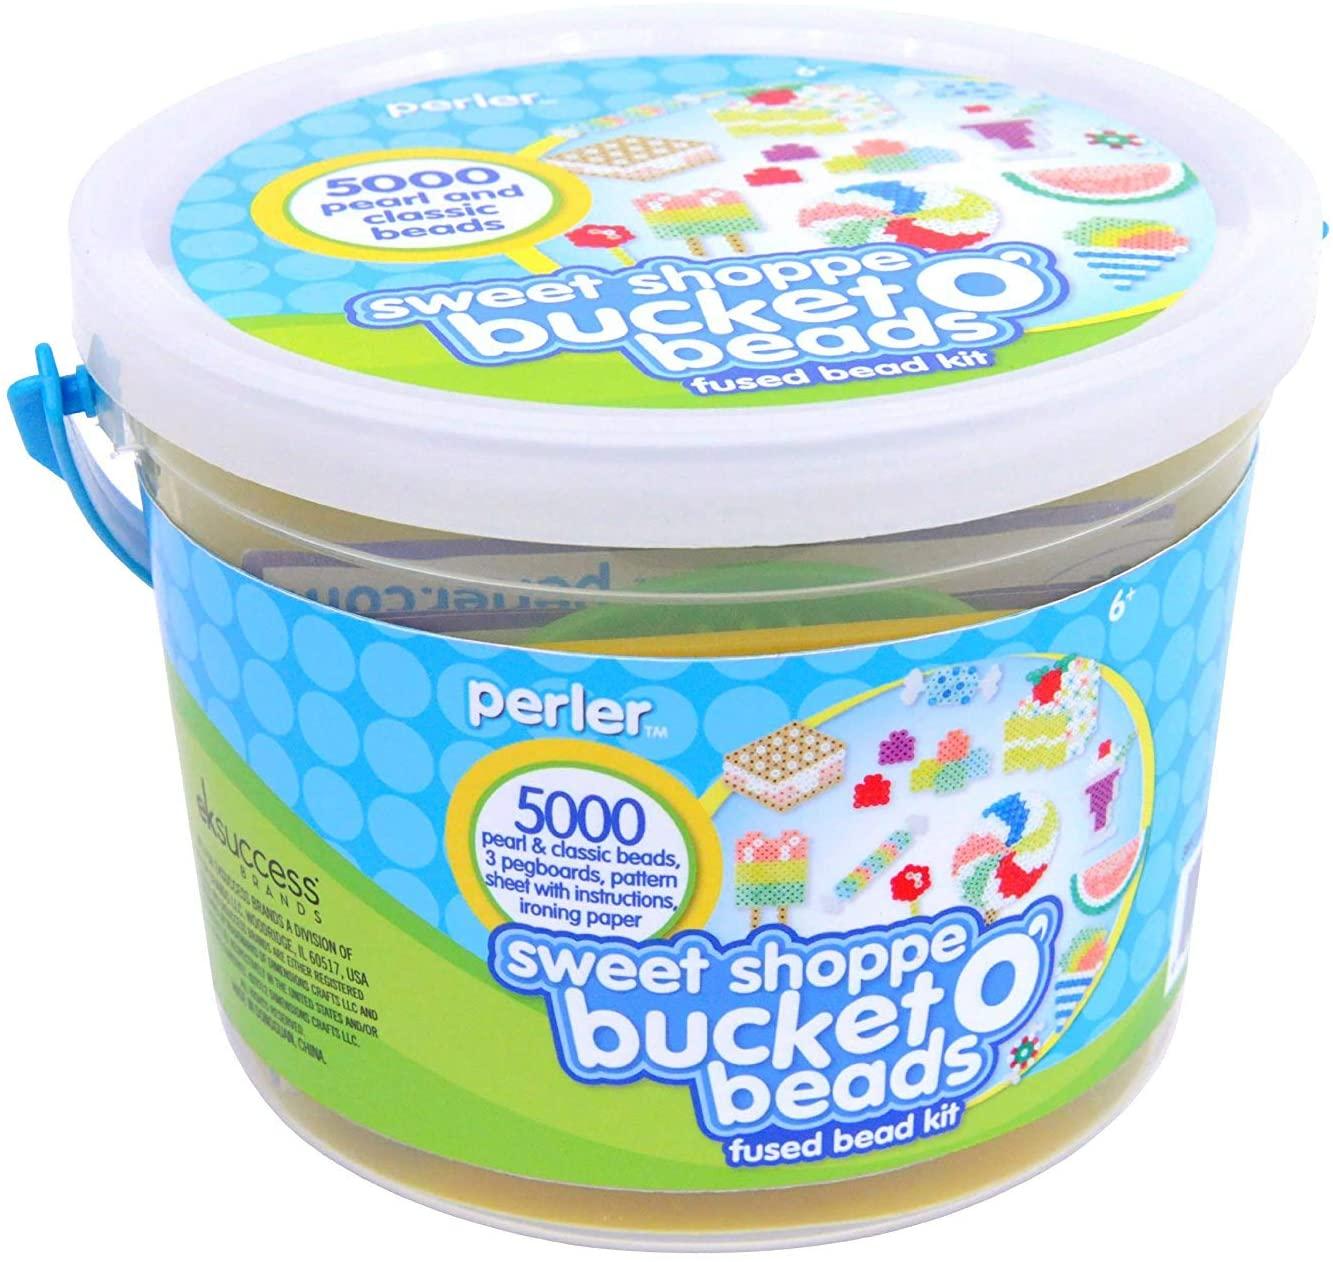 Perler Beads Sweet Shoppe Fuse Bead Bucket Craft Activity Kit, 5005 pcs